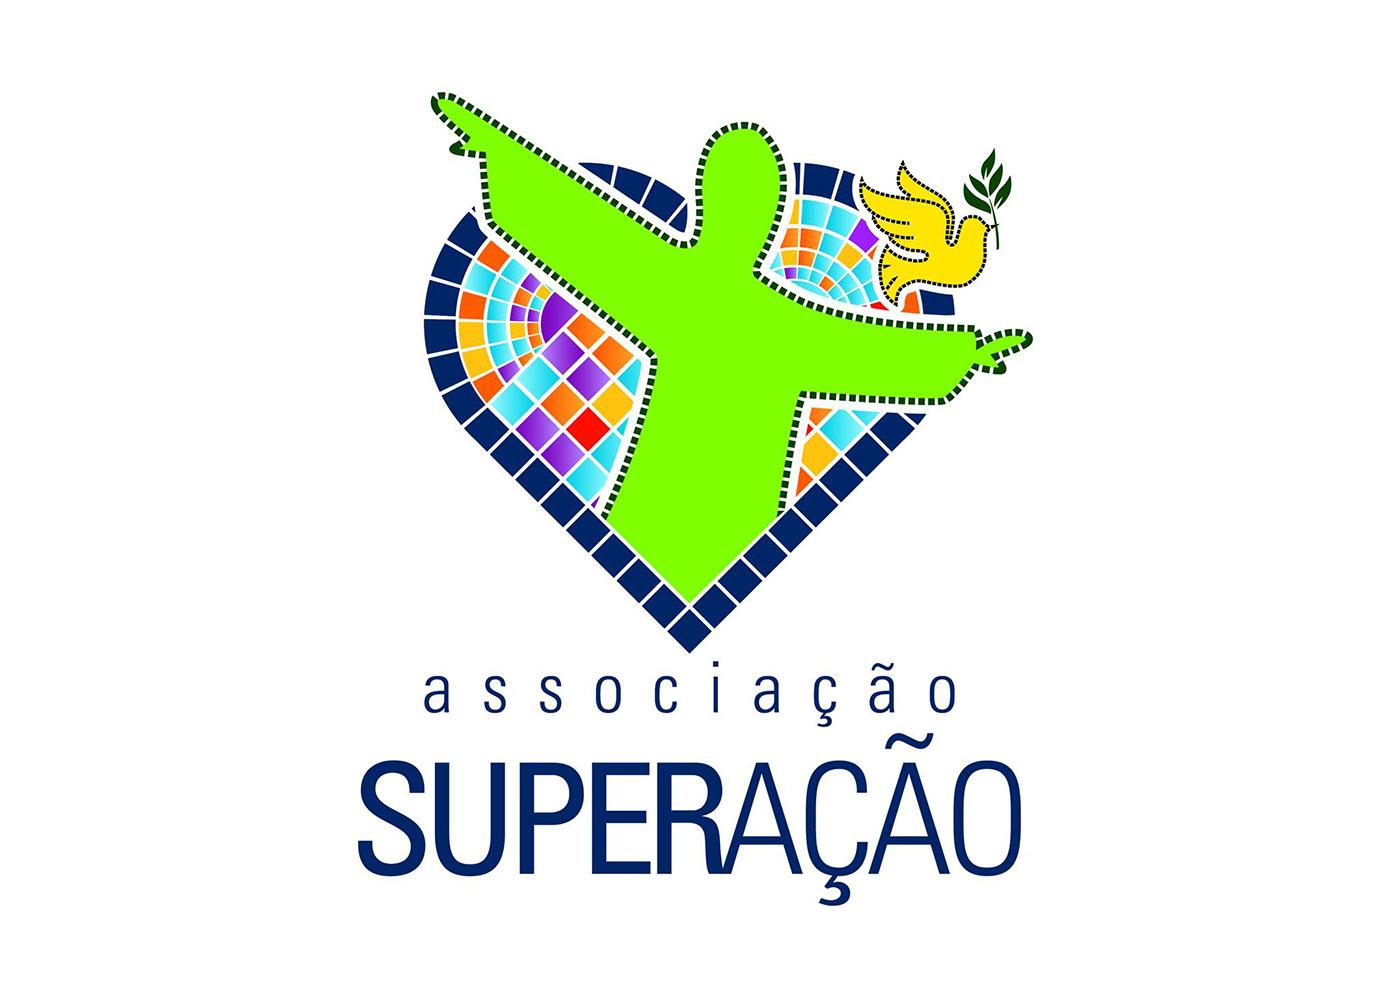 superacao neymarjr Neymar futebol soccer NGO